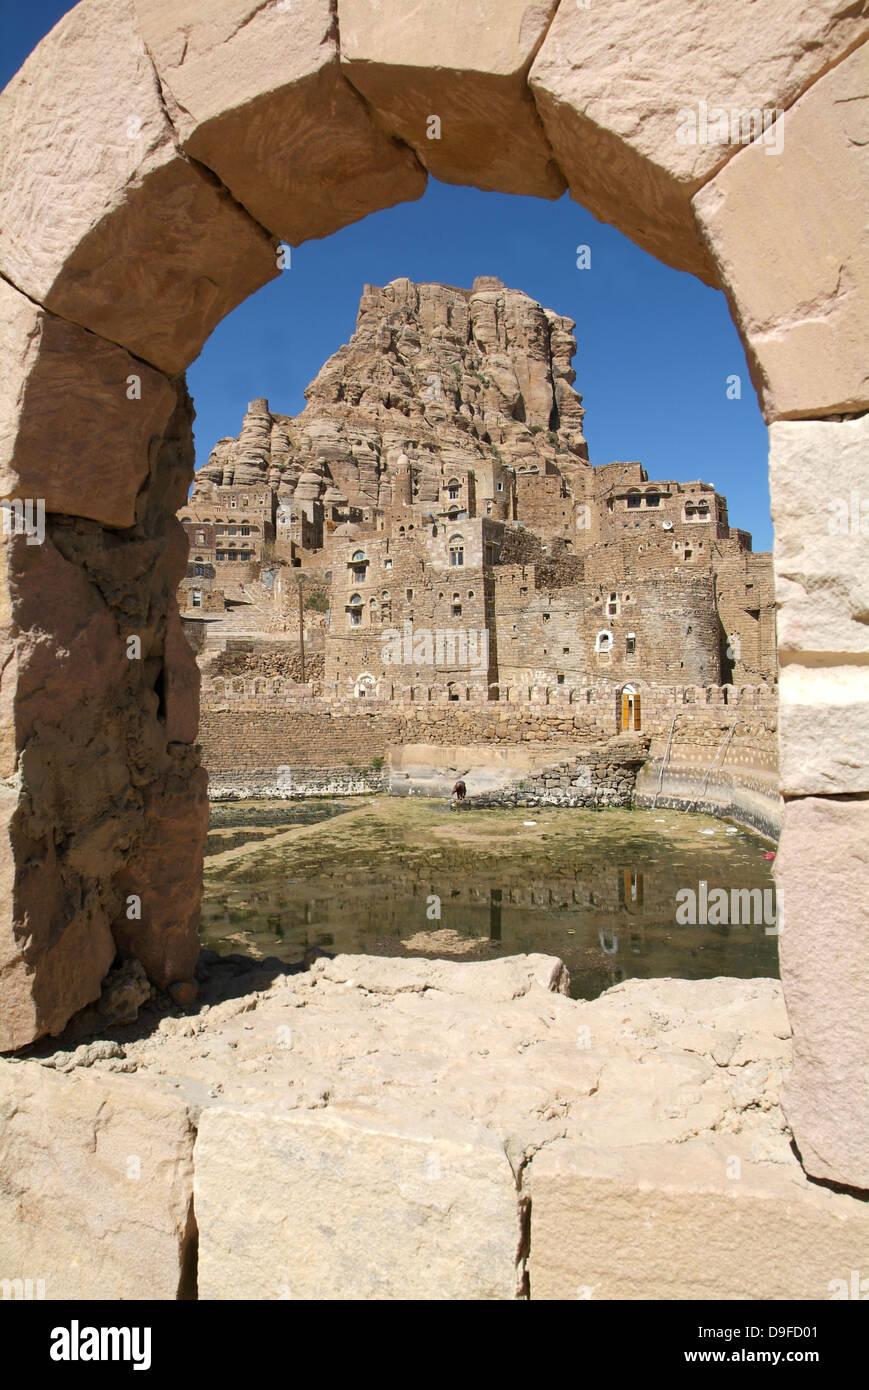 The village of Thula on Yemen - Stock Image